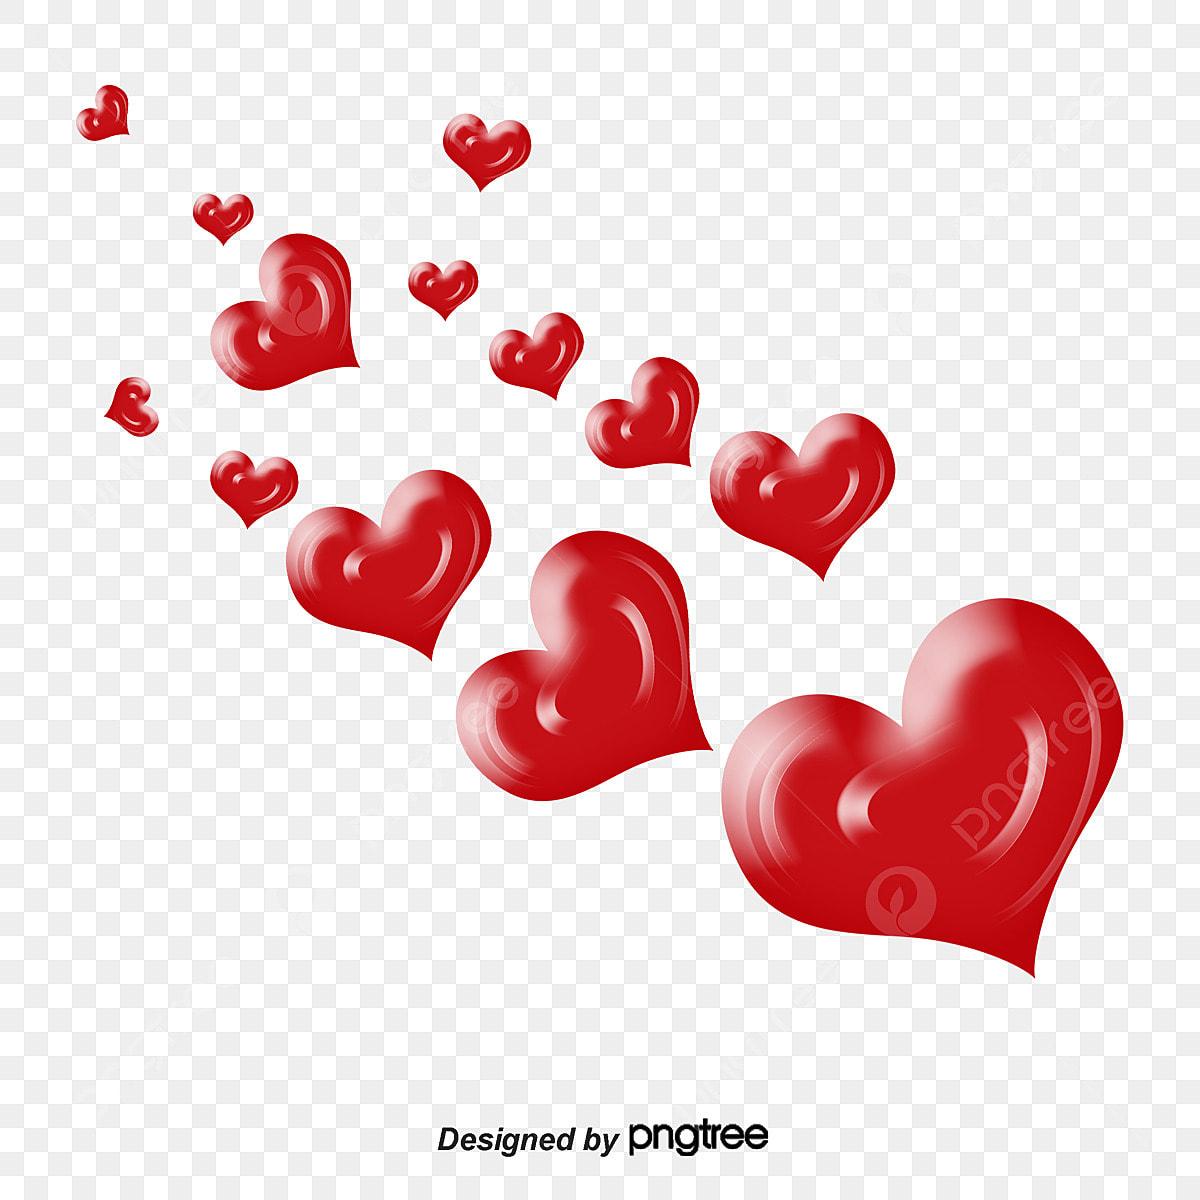 Fantasy Hearts, Hearts, Heart Crown, Cartoon Heart PNG Transparent